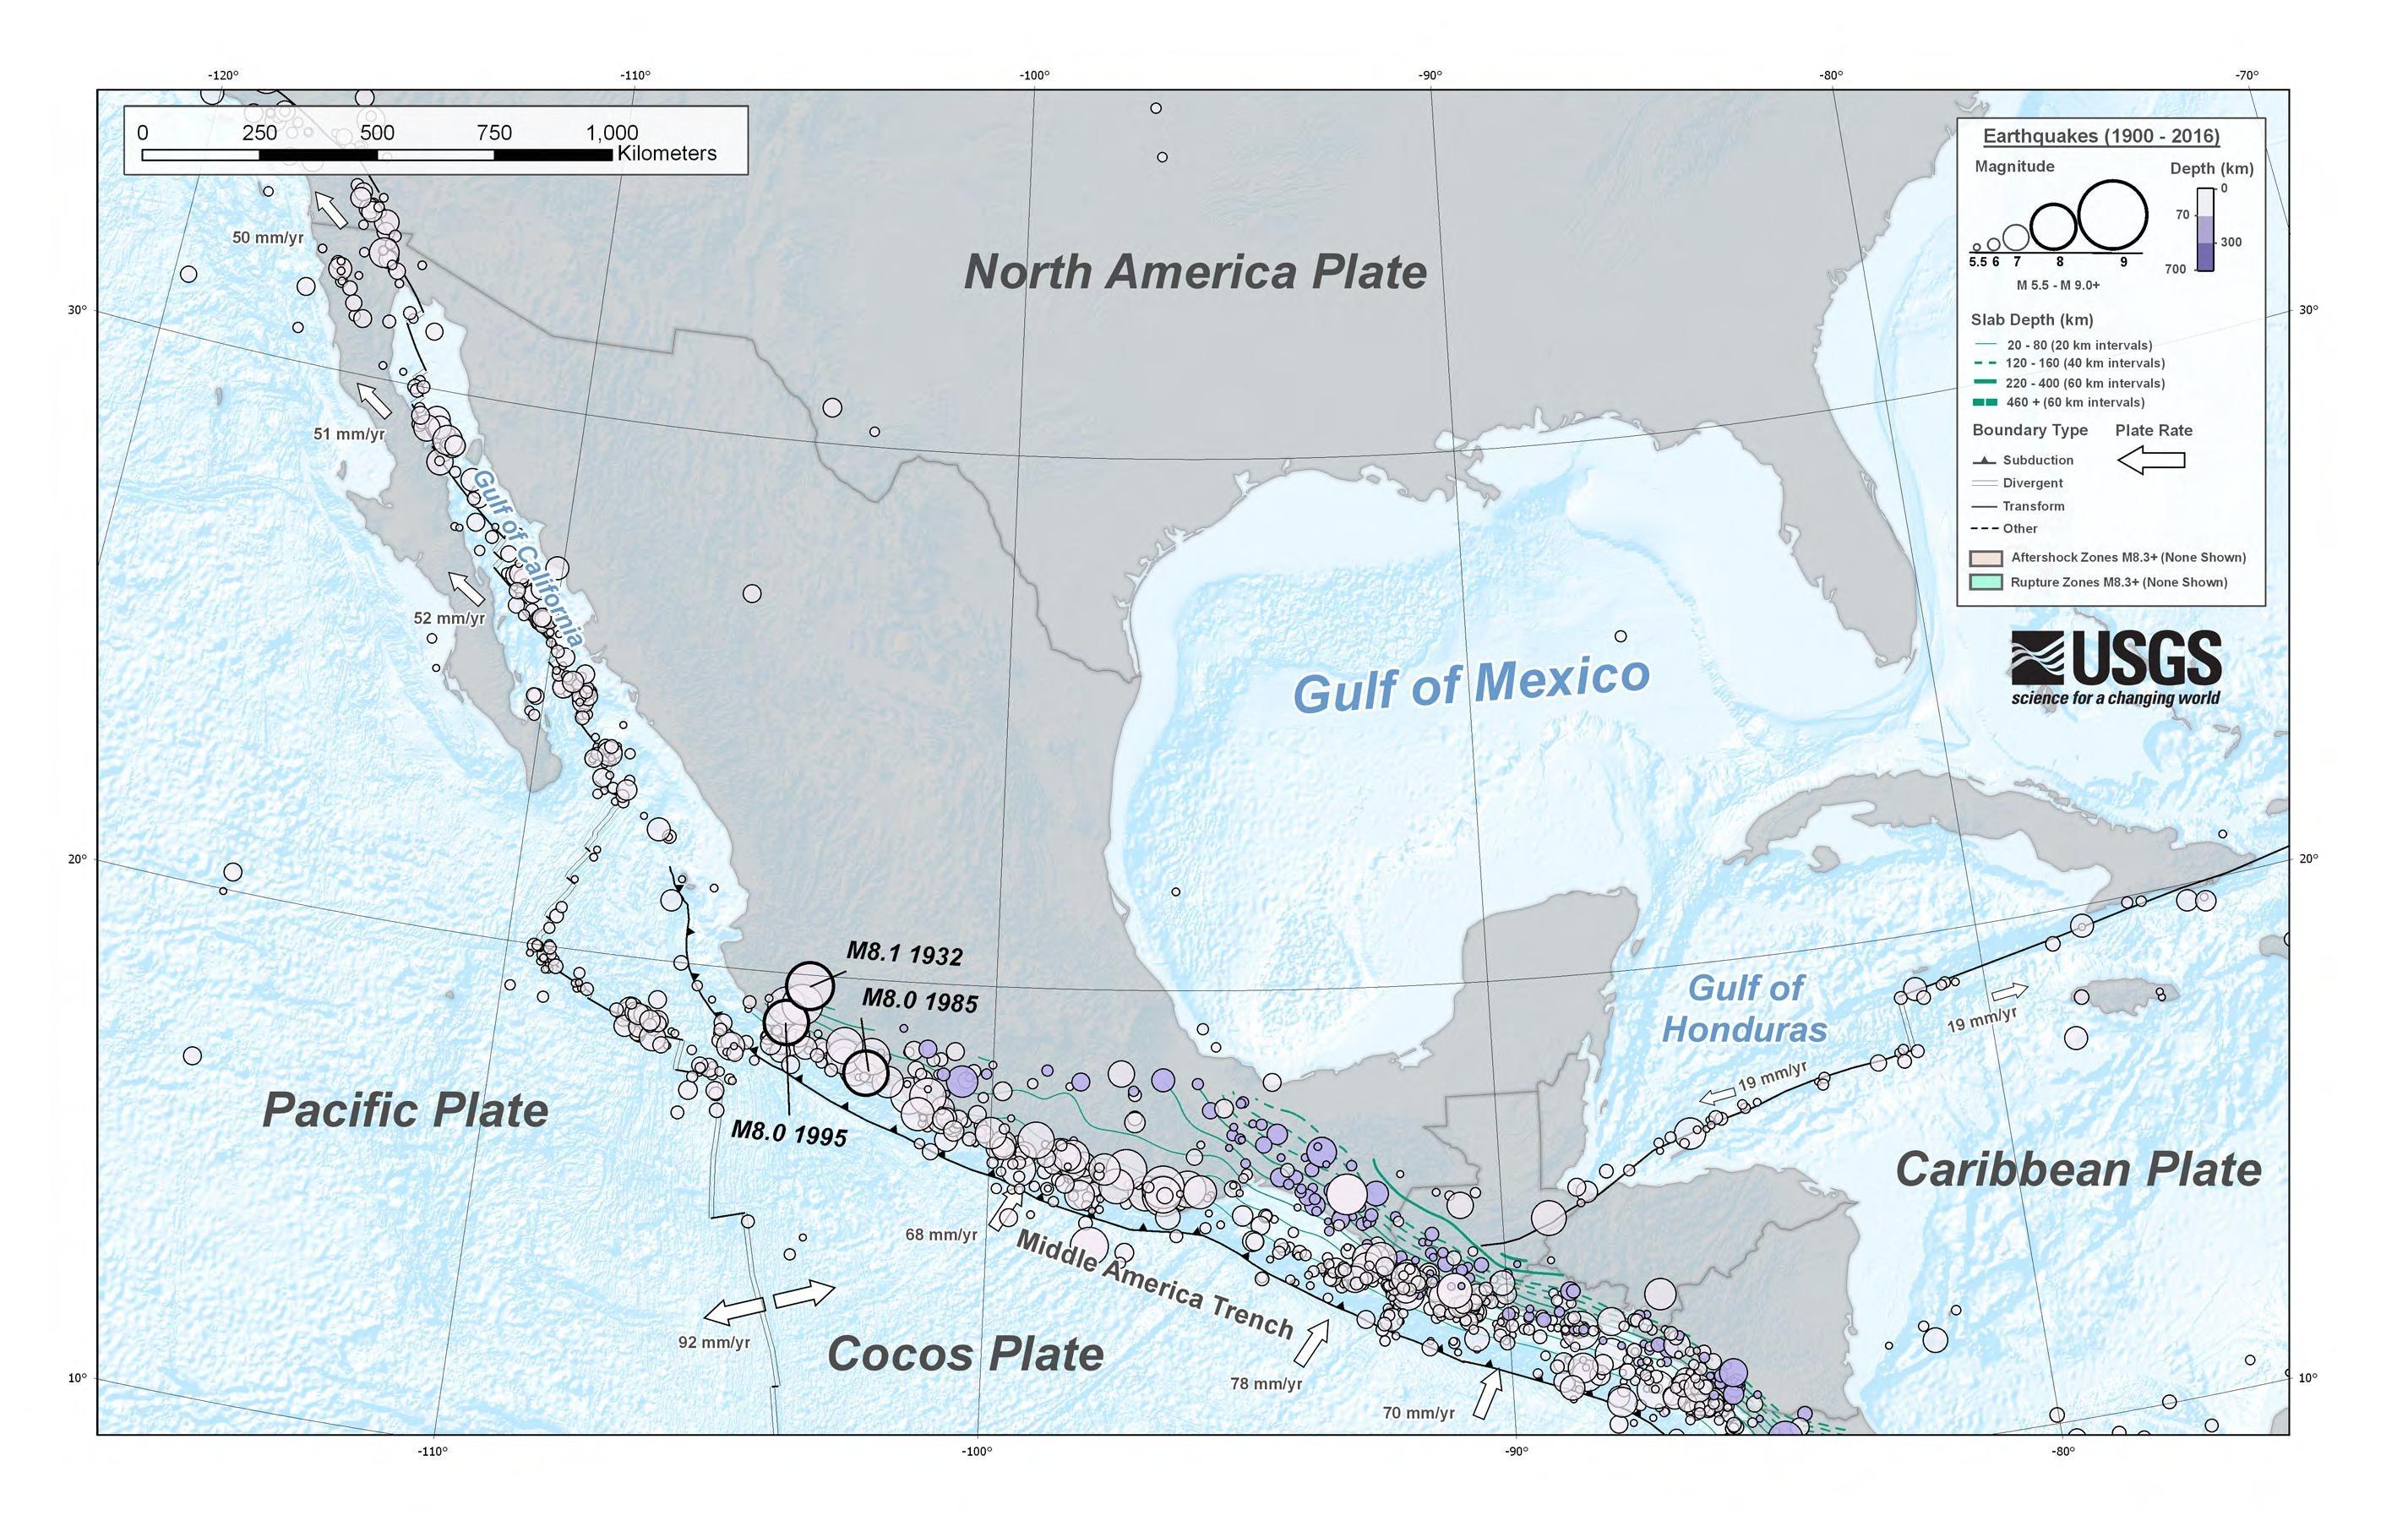 File:Map of Tectonic Summary Region (Mexico).pdf - Wikimedia Commons